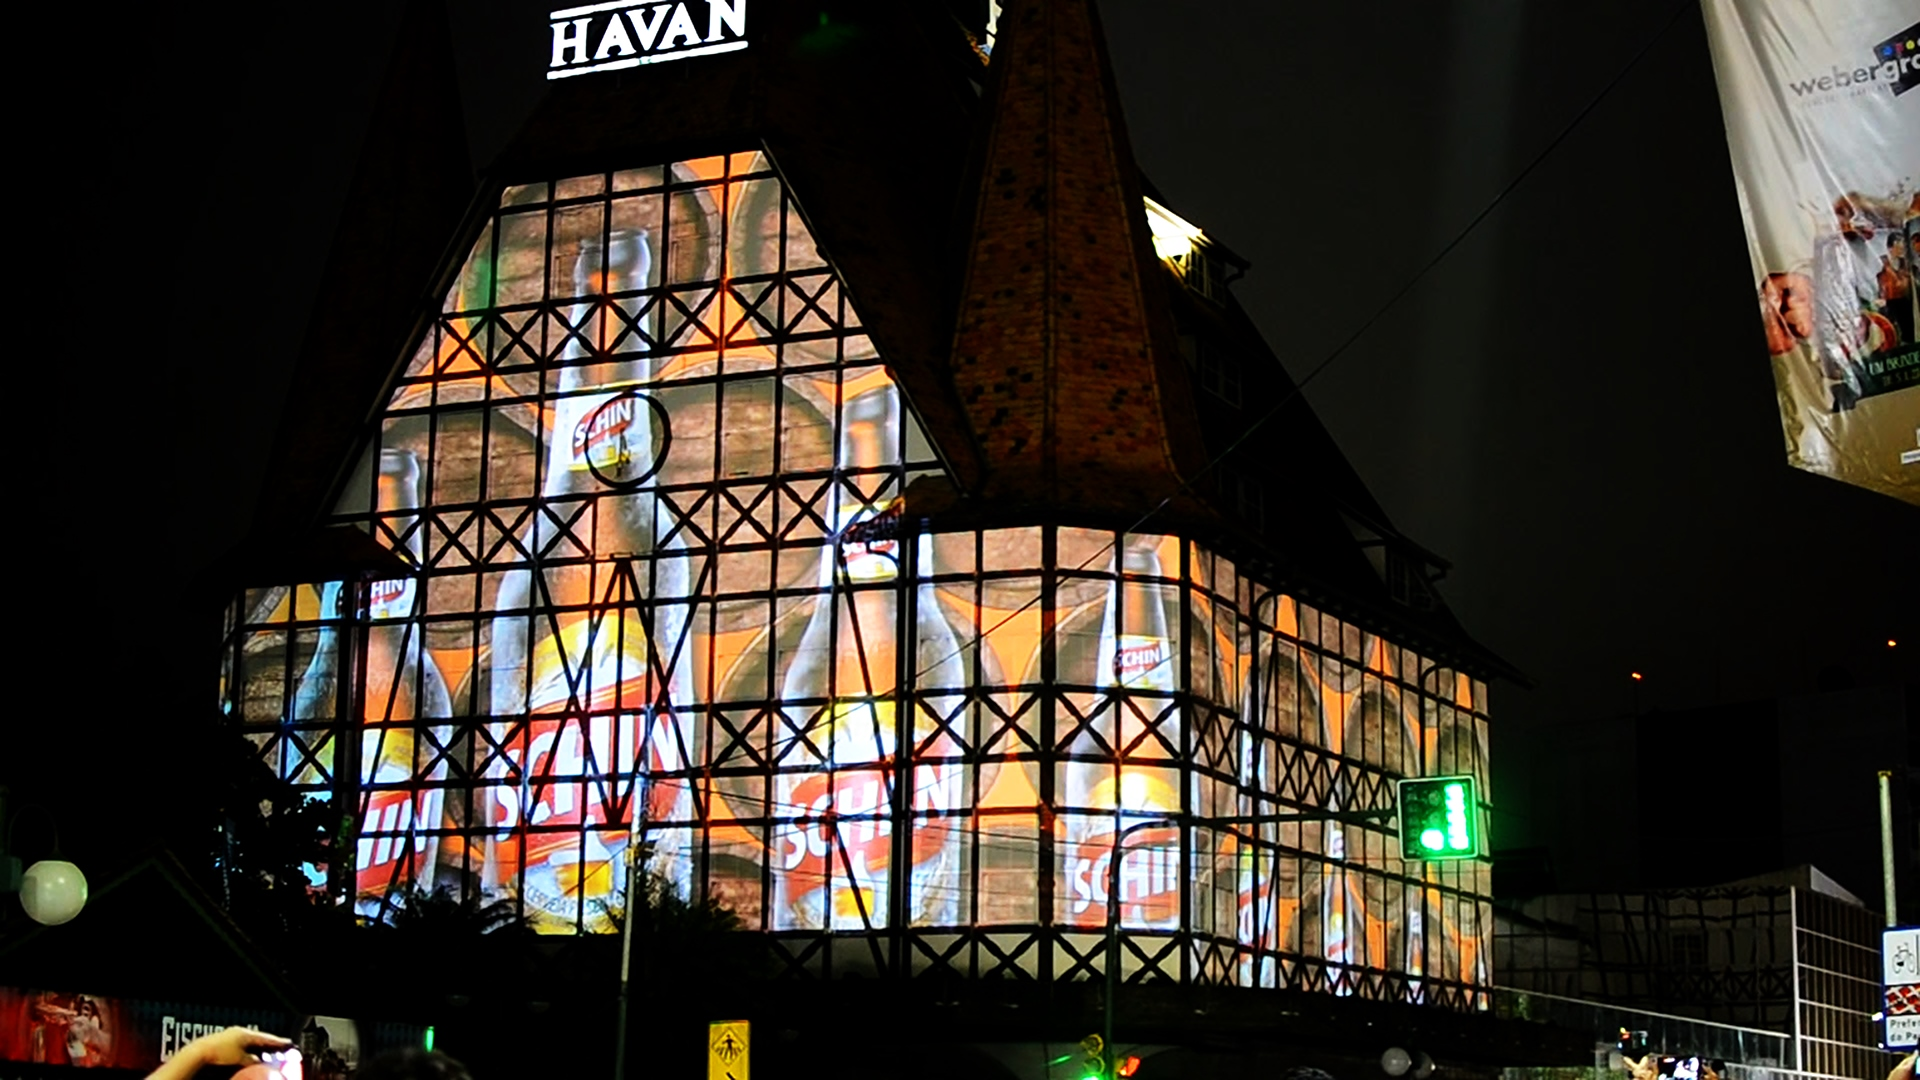 Mapping Externo - SC - Blumenau - Havan - Oktoberfest - 2